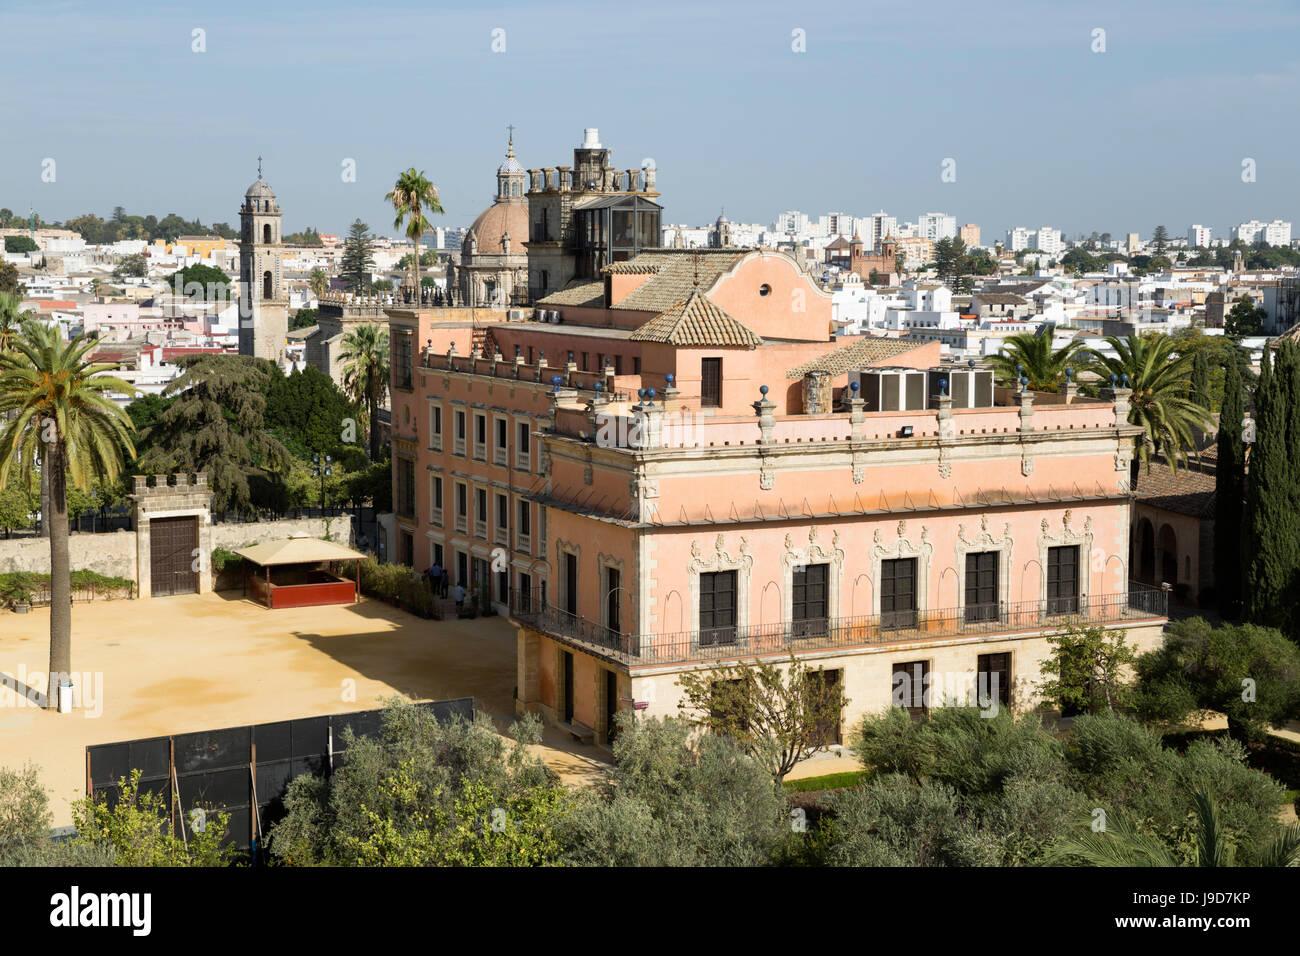 Palacio de Villavicencio all'interno dell'Alcazar, Jerez de la Frontera, la provincia di Cadiz Cadice, Andalusia, Foto Stock